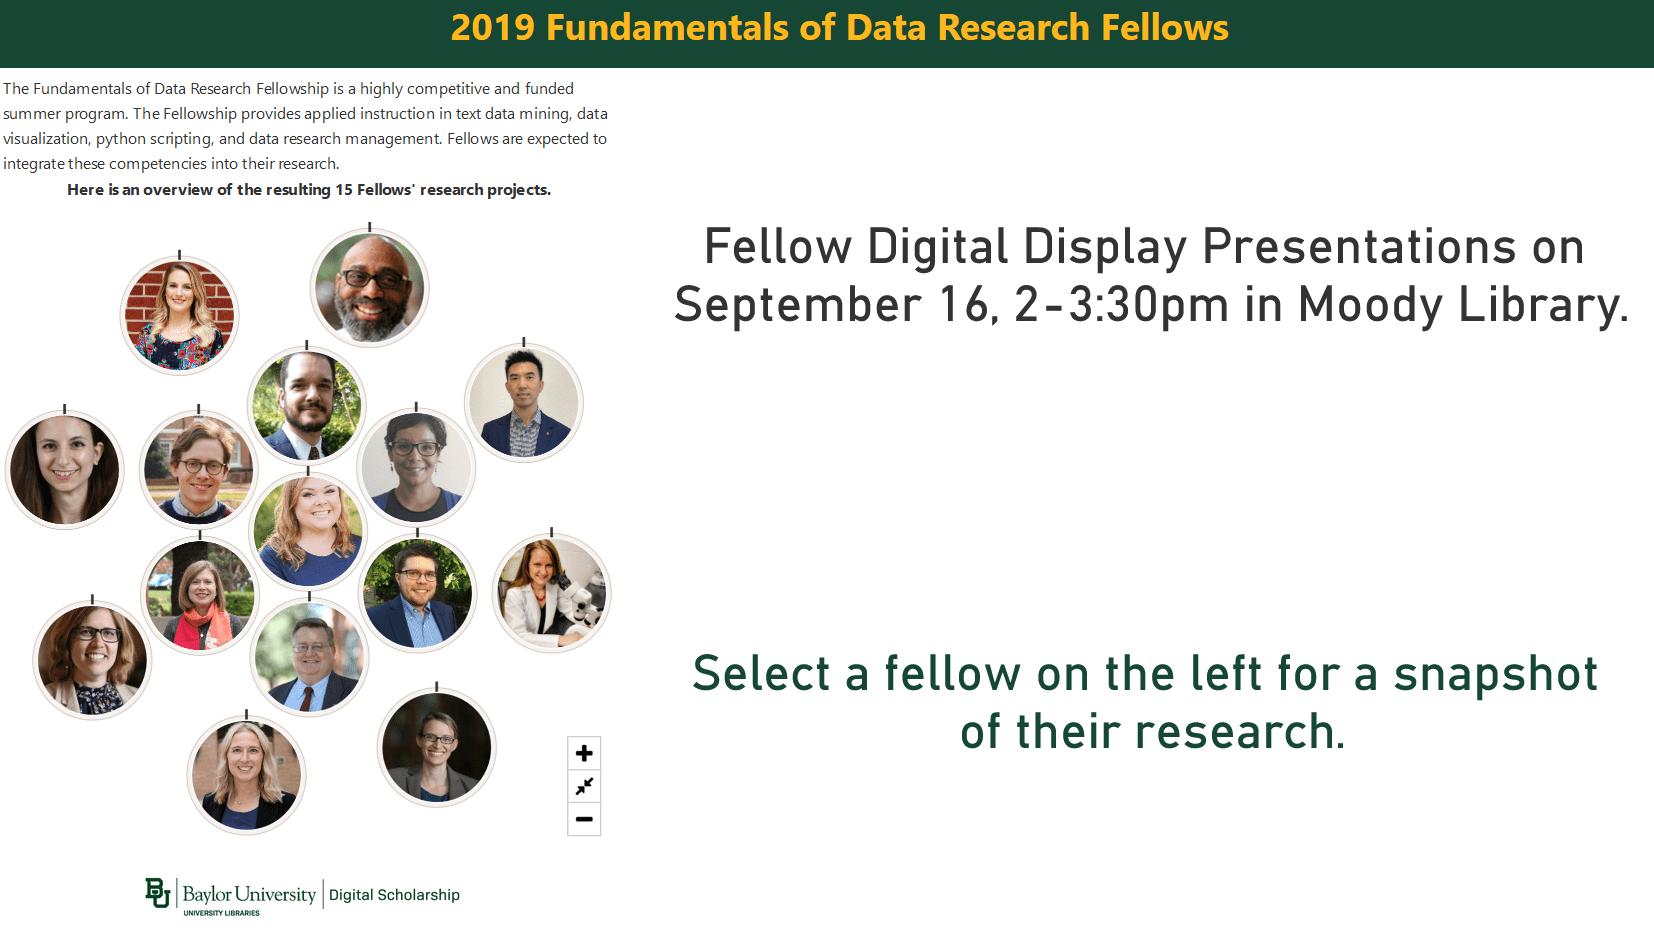 Fundamentals of Data Research Fellowship Program